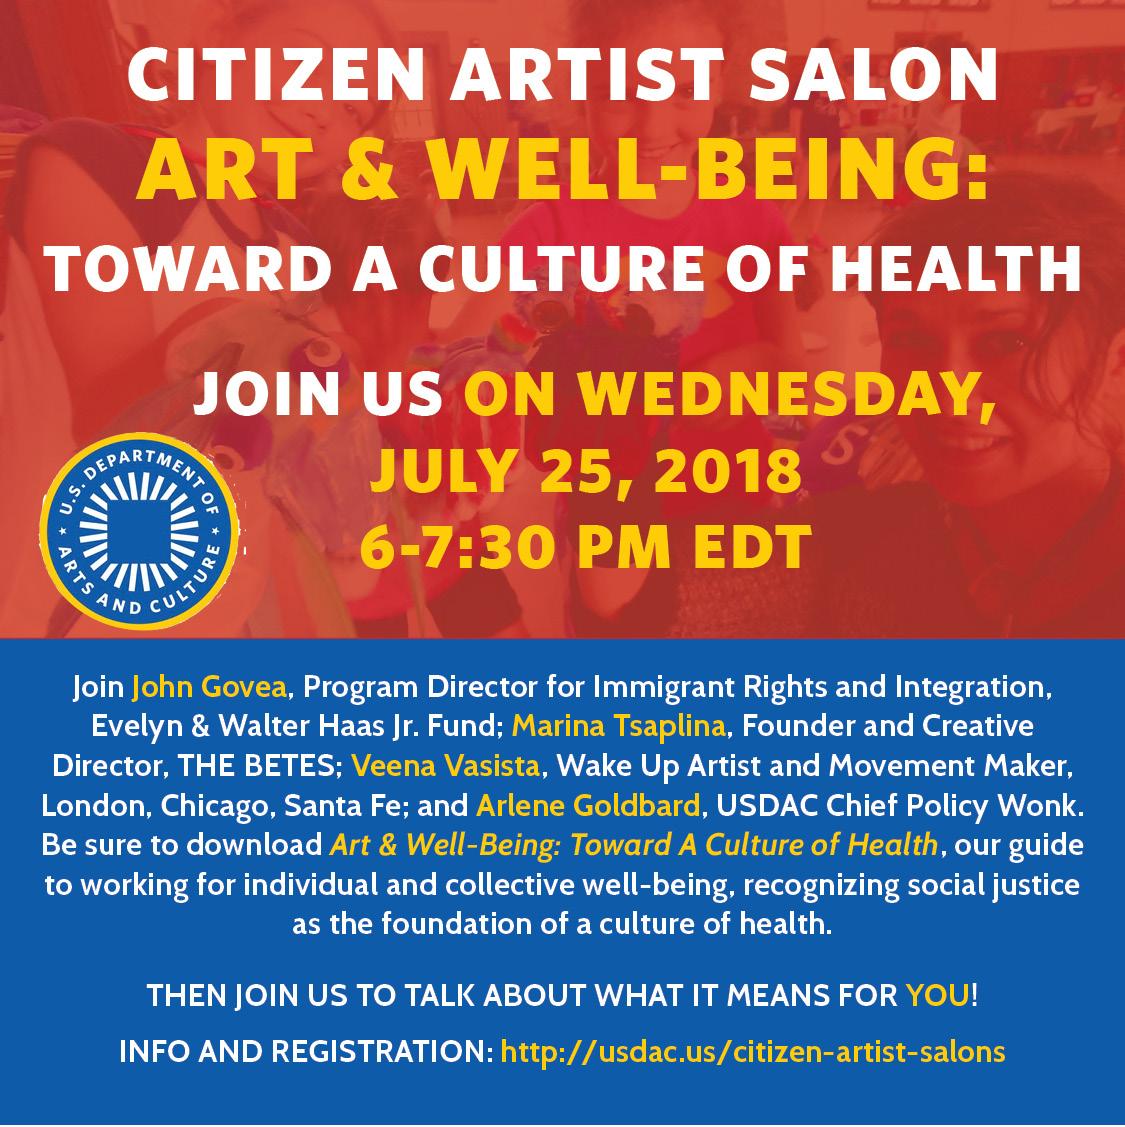 Citizen Artist Salon: Art & Well-Being — U.S. Department of Arts and Culture